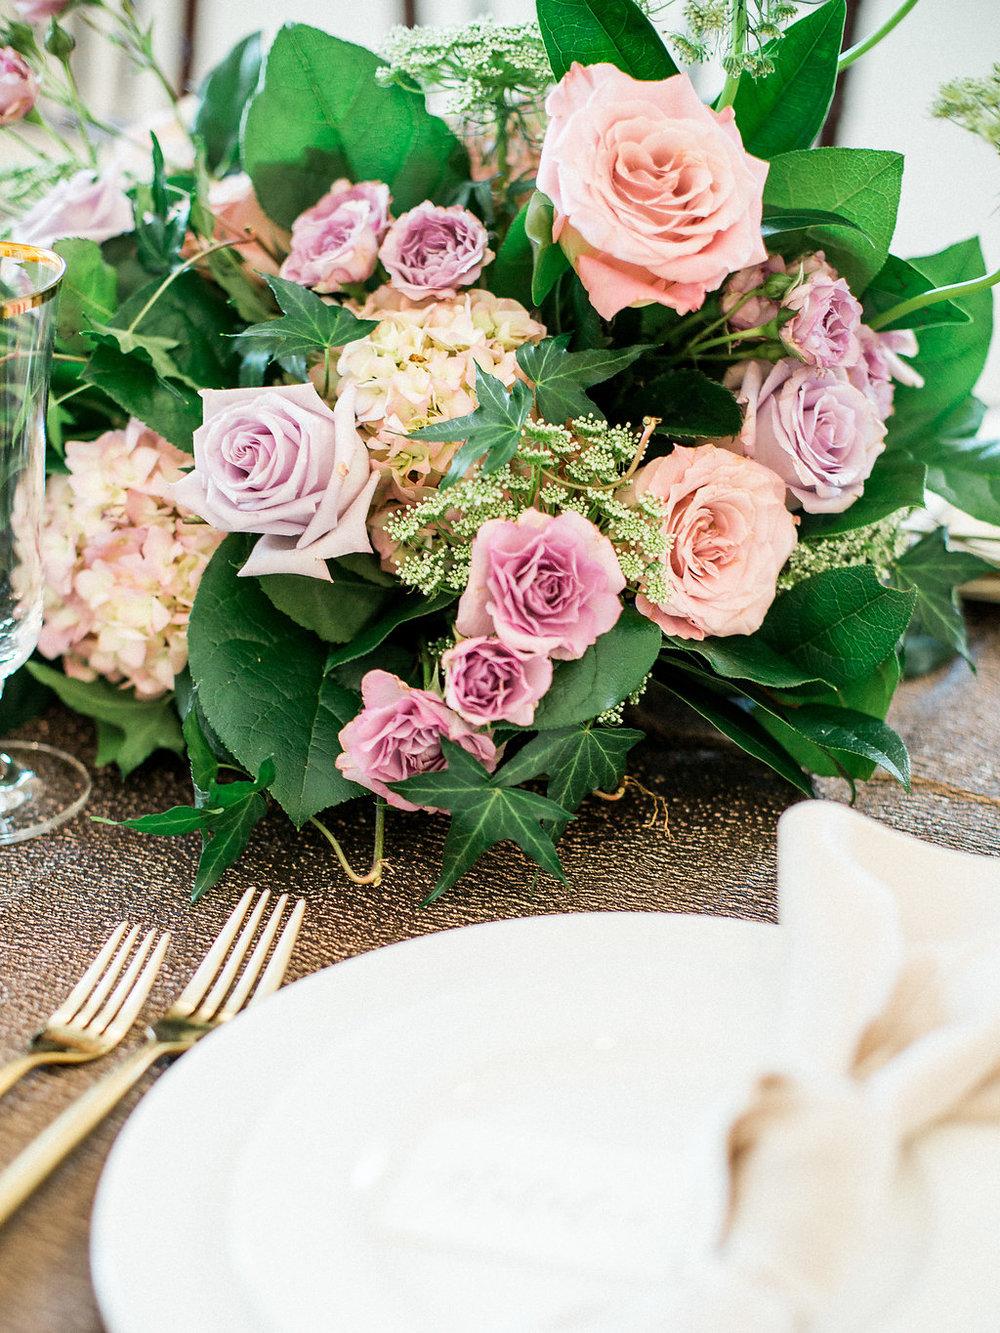 Rose Wedding Centrepiece - Wedding Florists Winnipeg